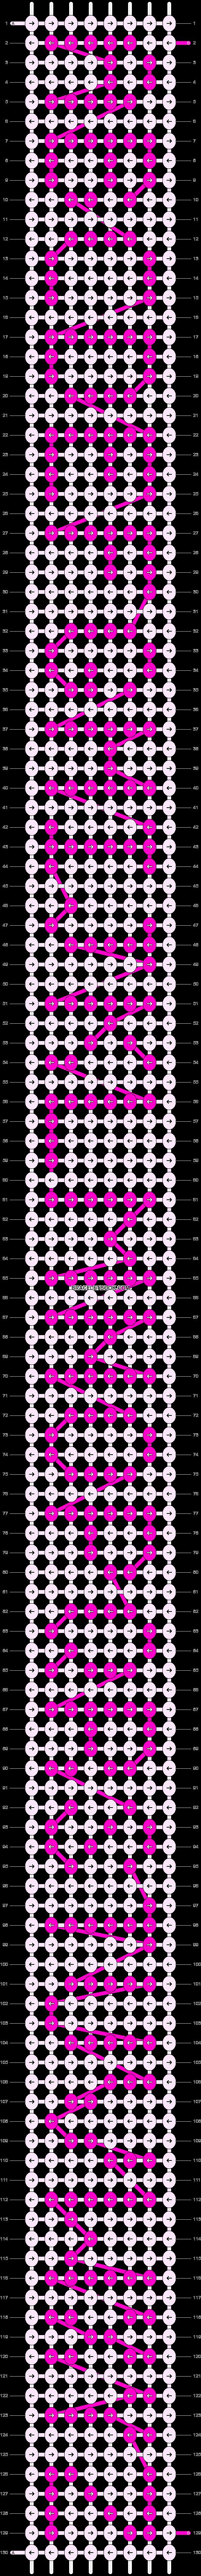 Alpha pattern #5179 pattern